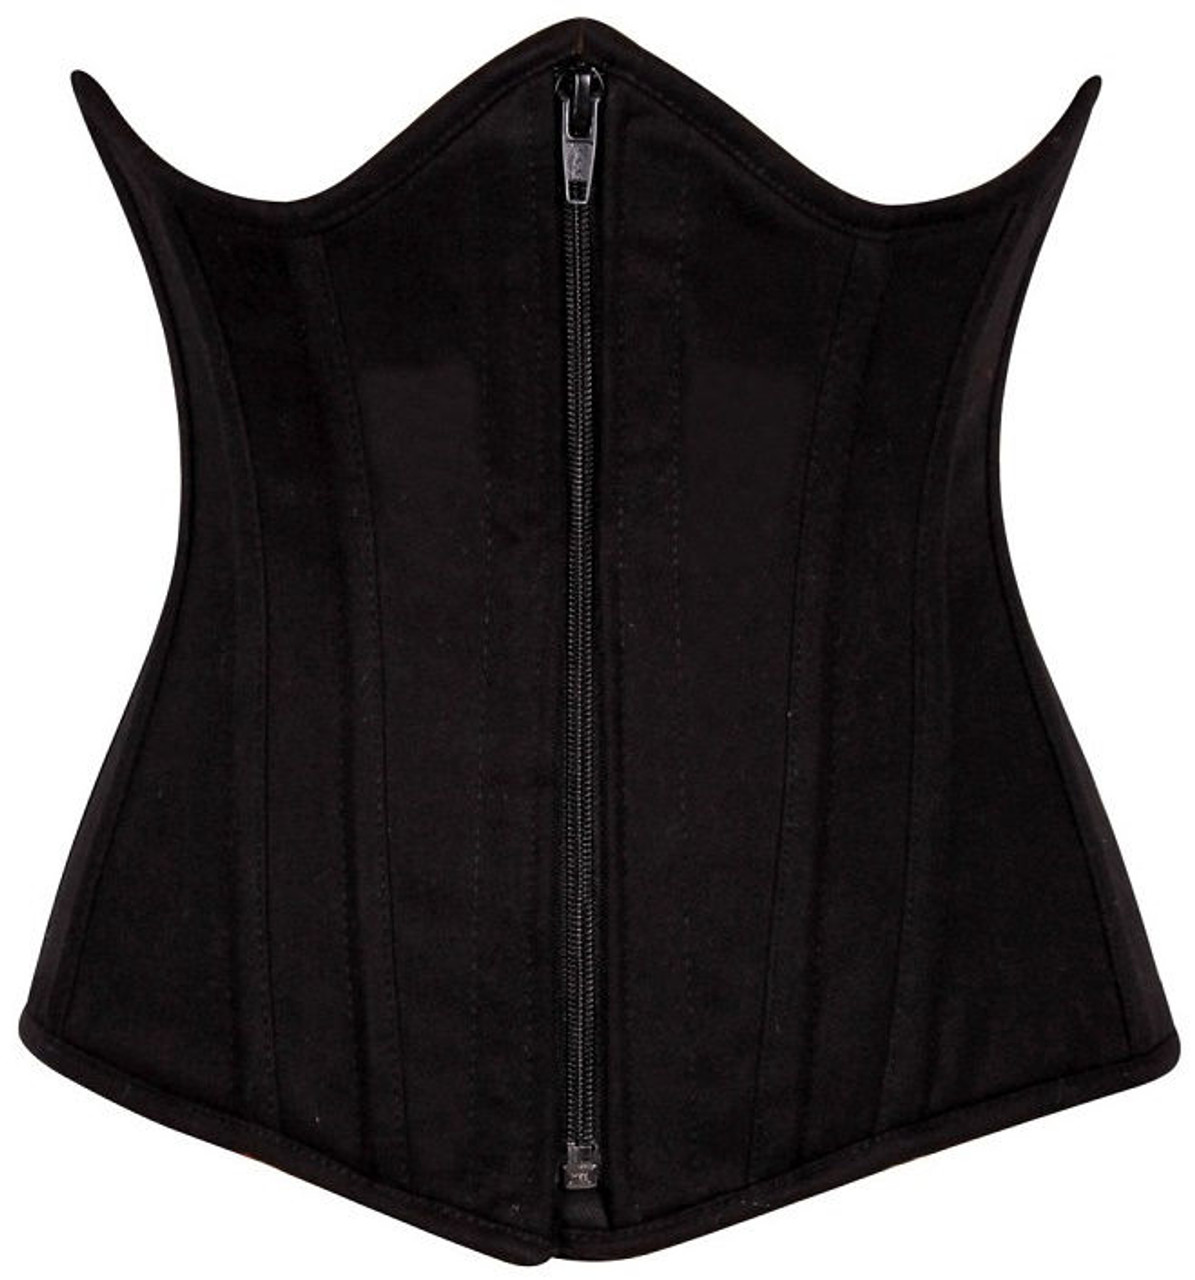 842b601f00 Black cotton Steel Boned underbust Corset